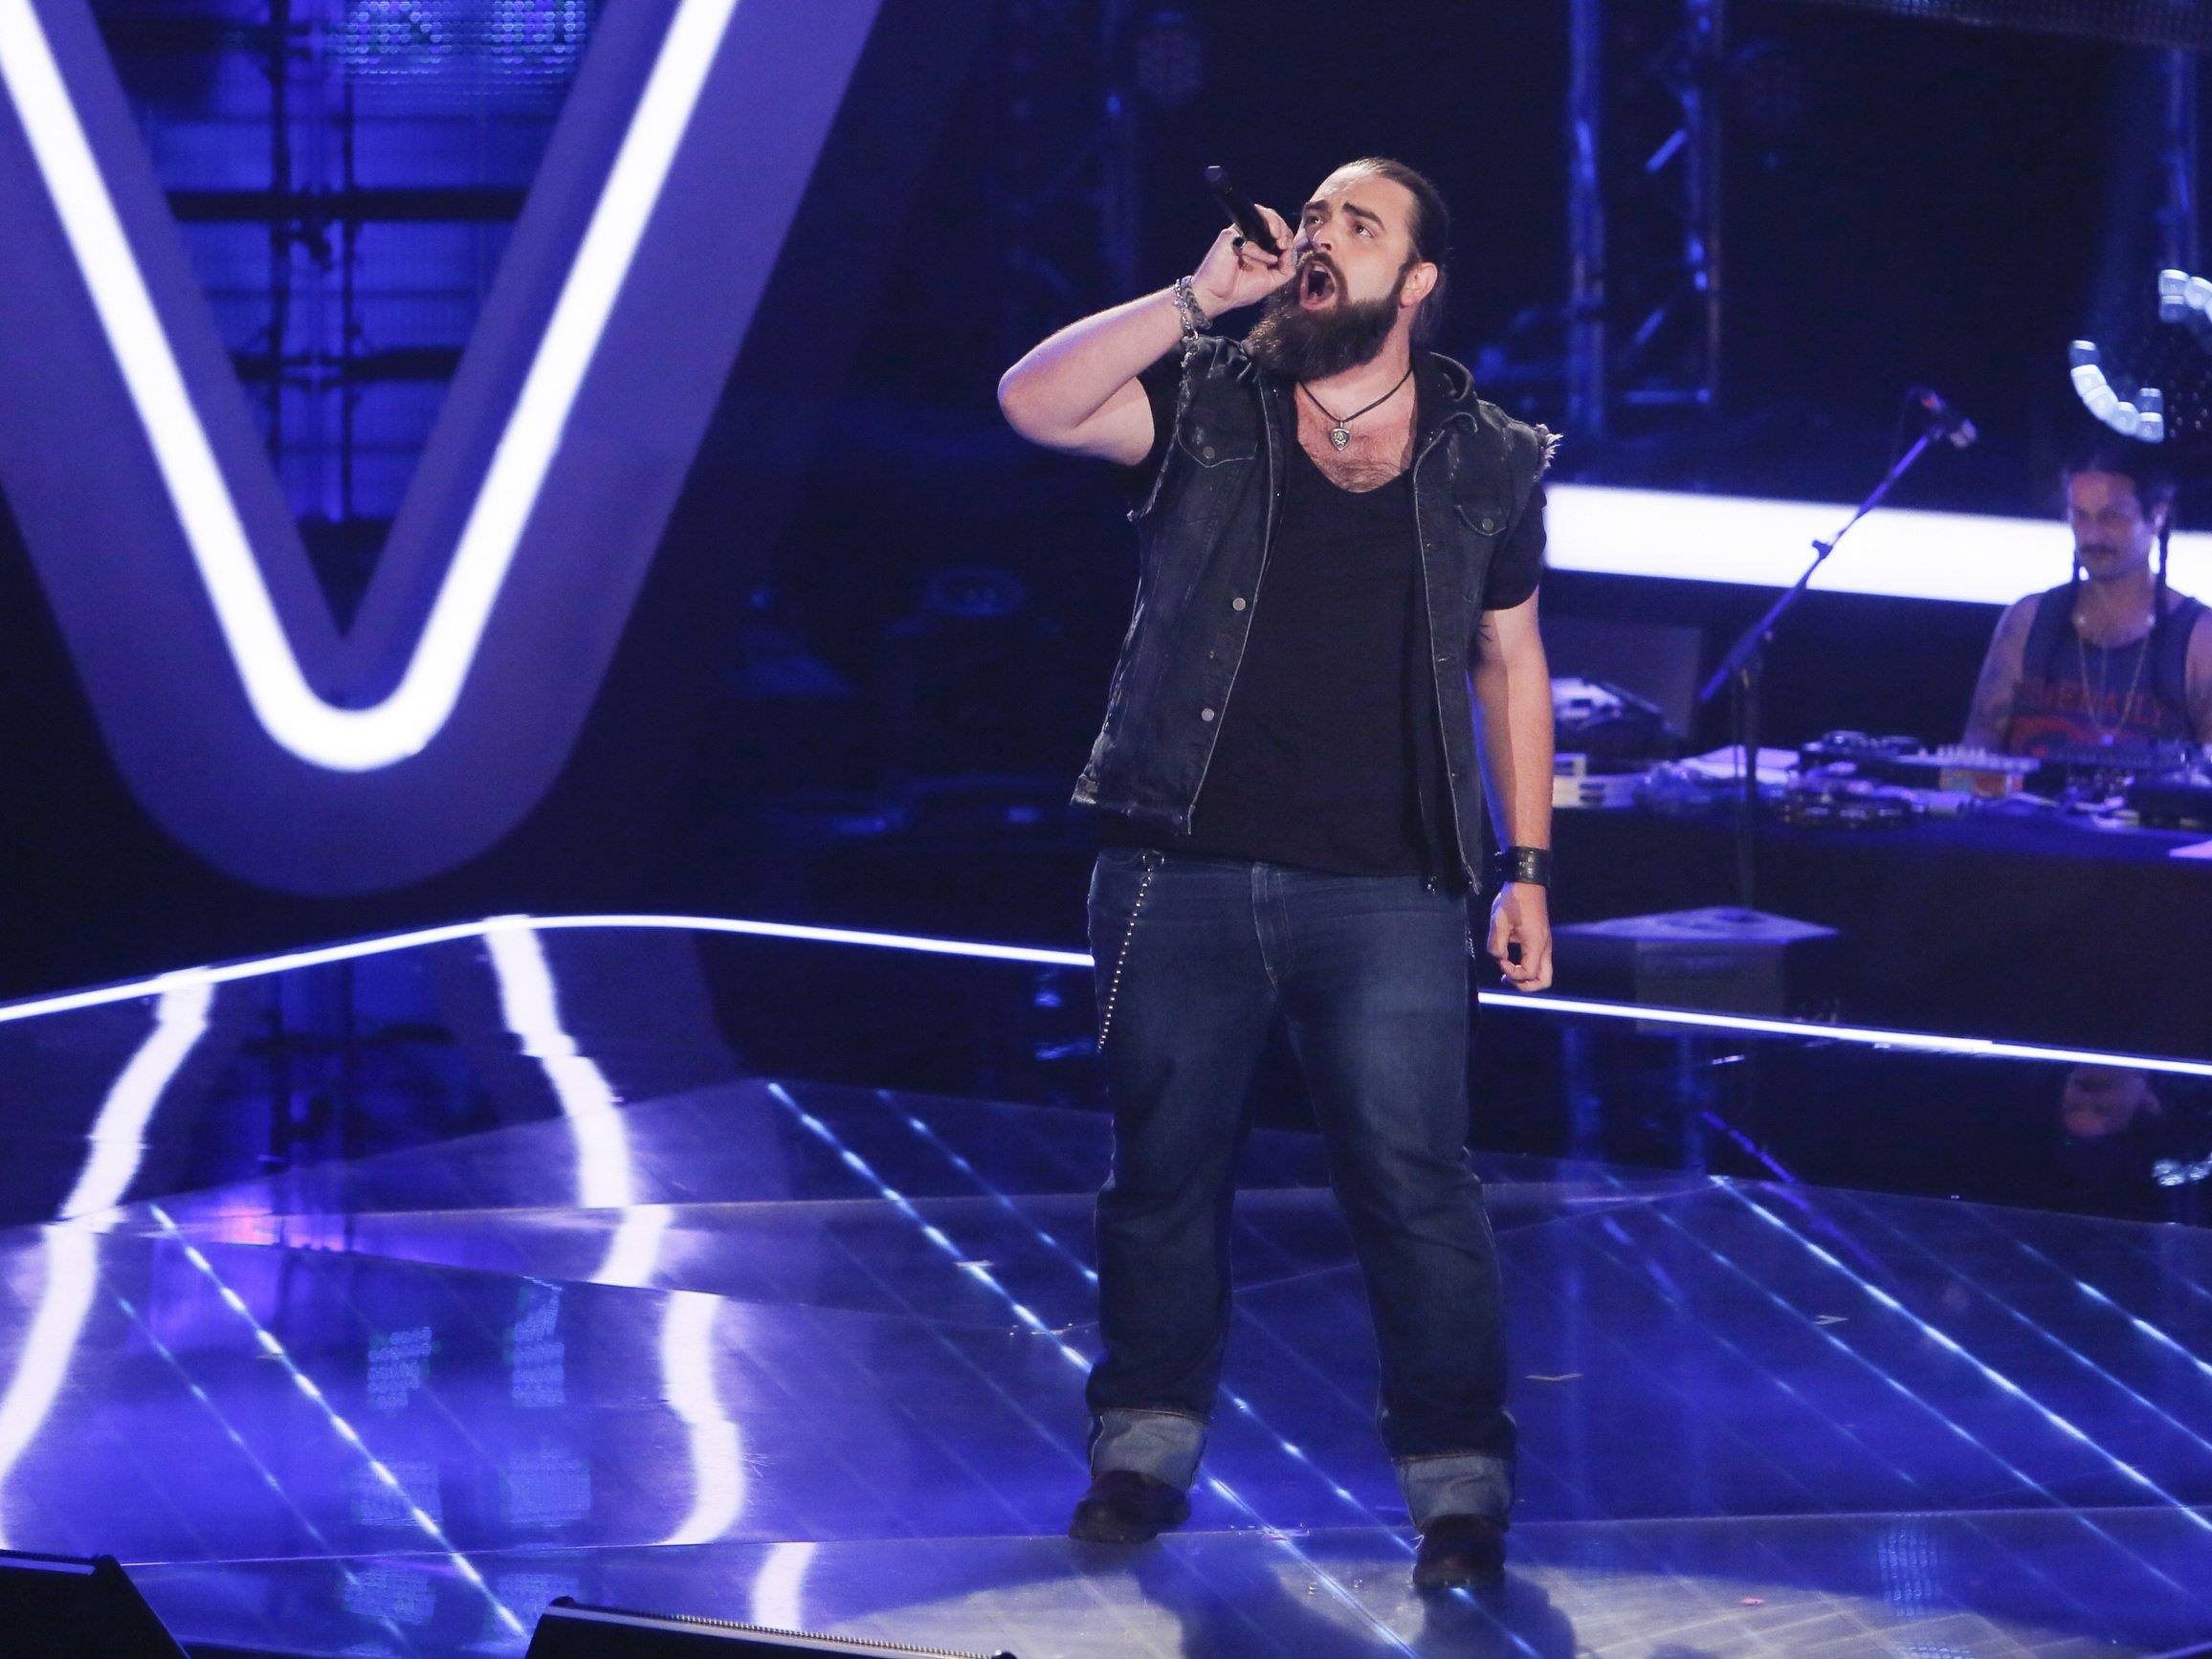 The Voice of Germany: Talent Michael singt zweistimmig mit sich selbst.